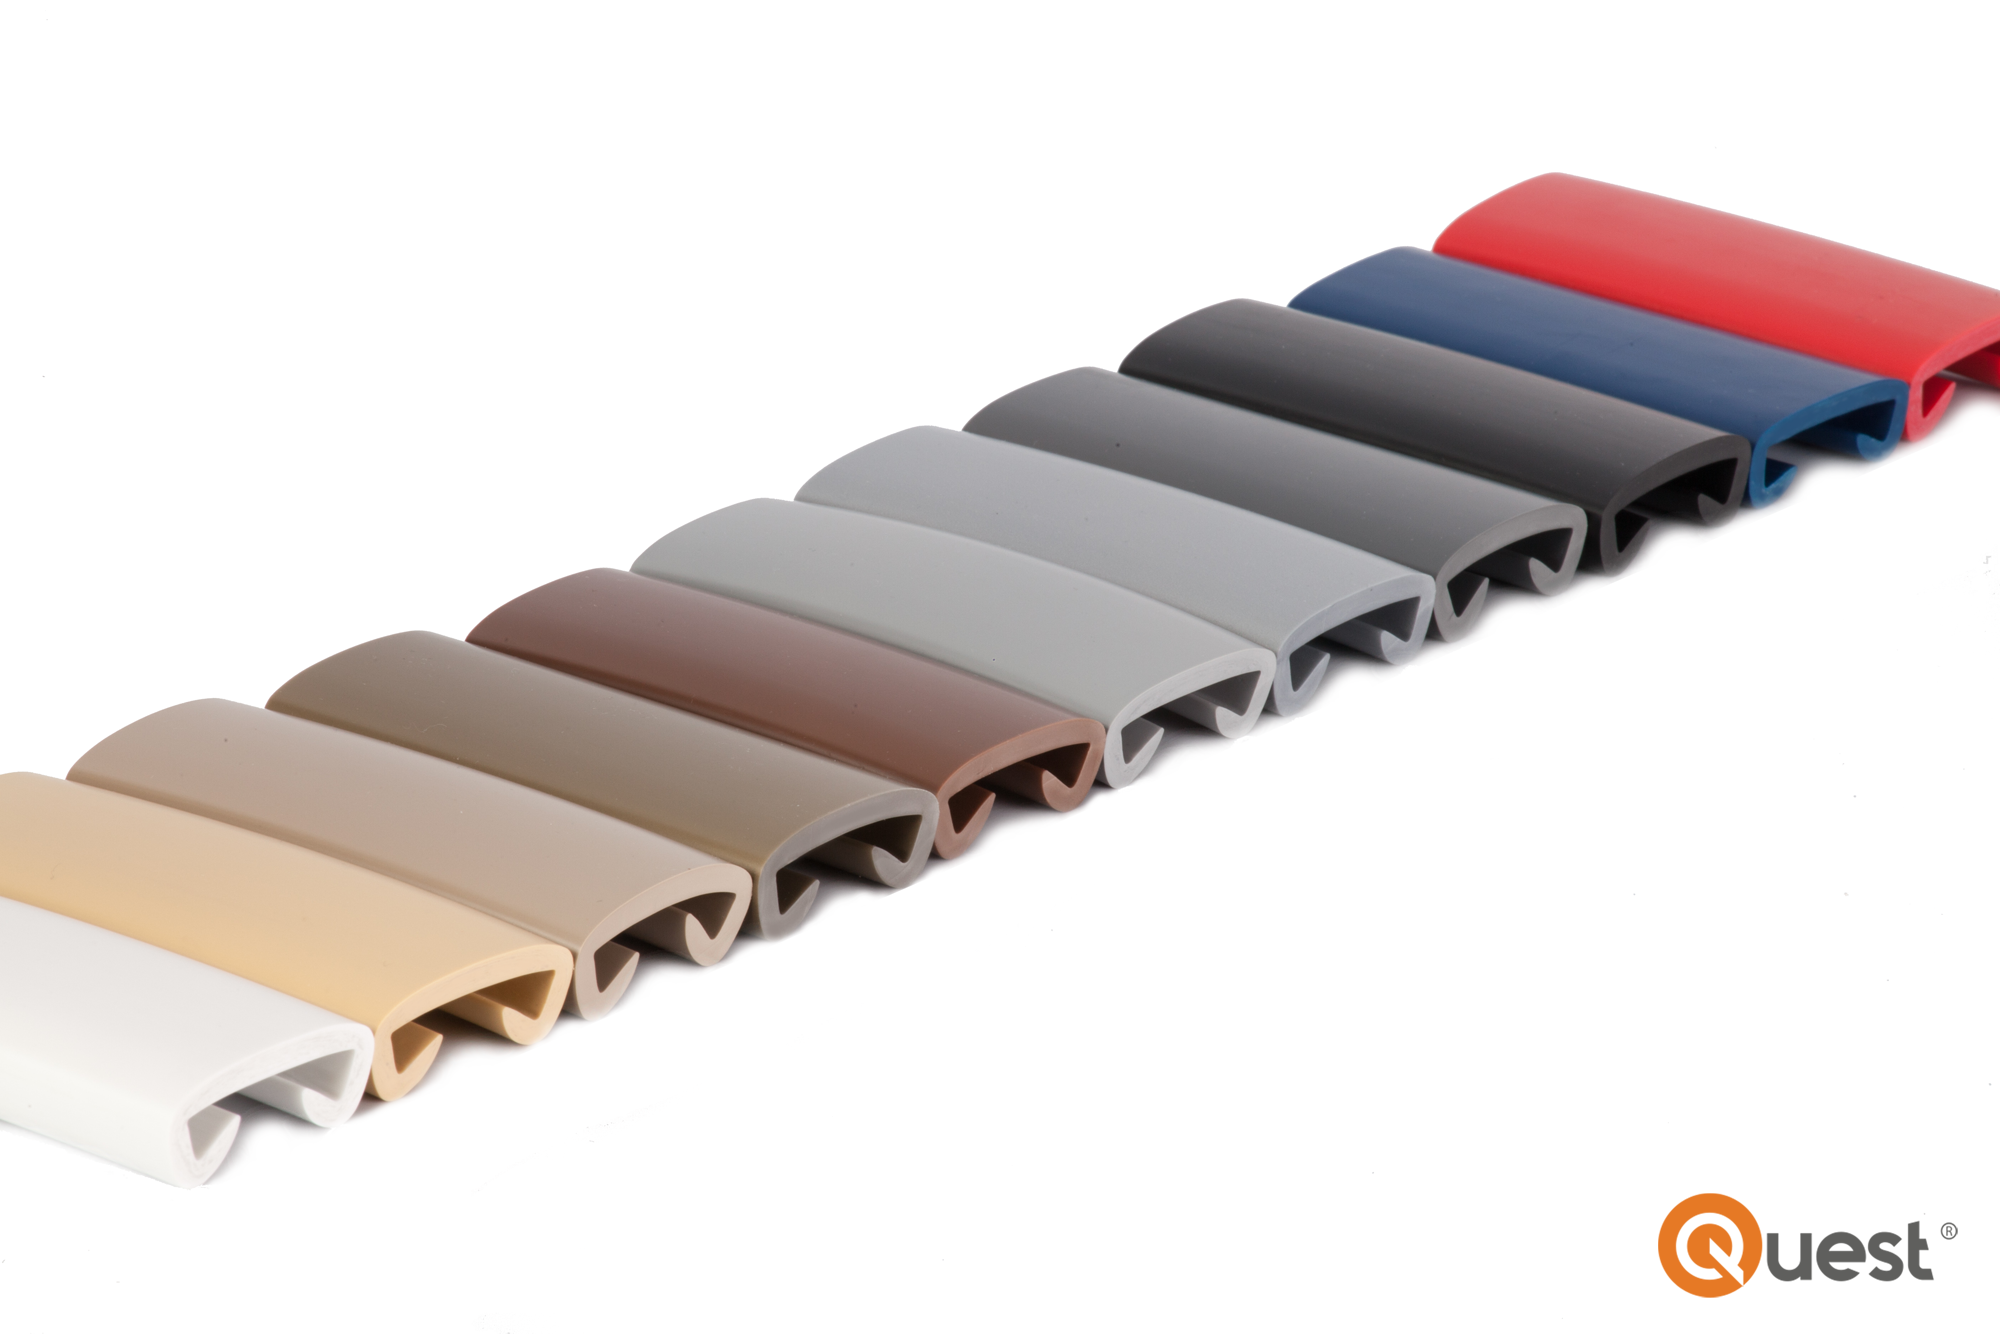 10m PVC Handlauf Treppenhandlauf Kunststoffhandlauf 40x8 mm silber